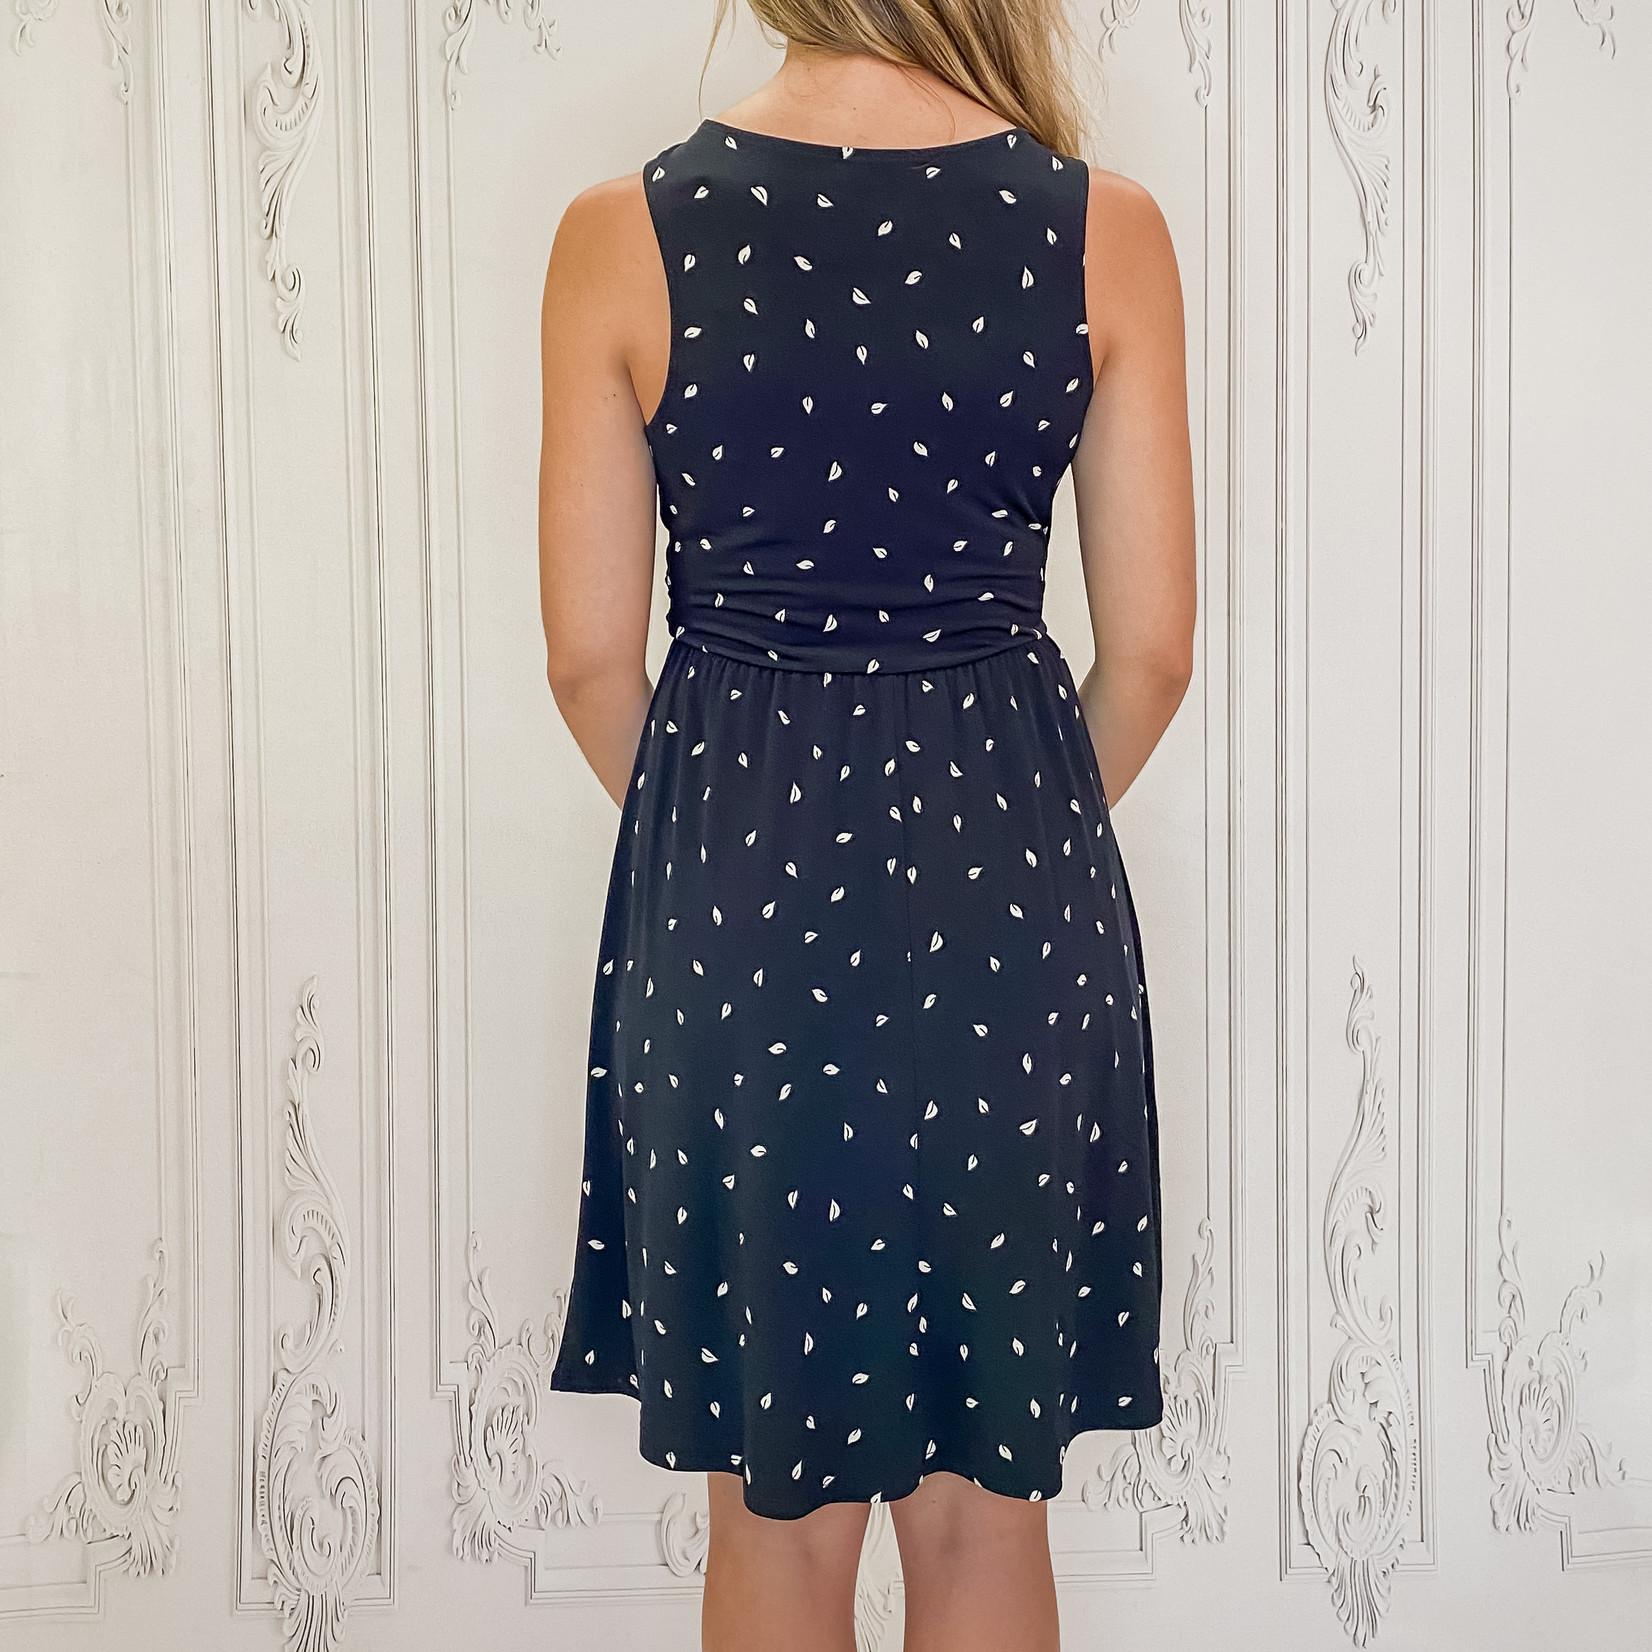 Gia front twist dress